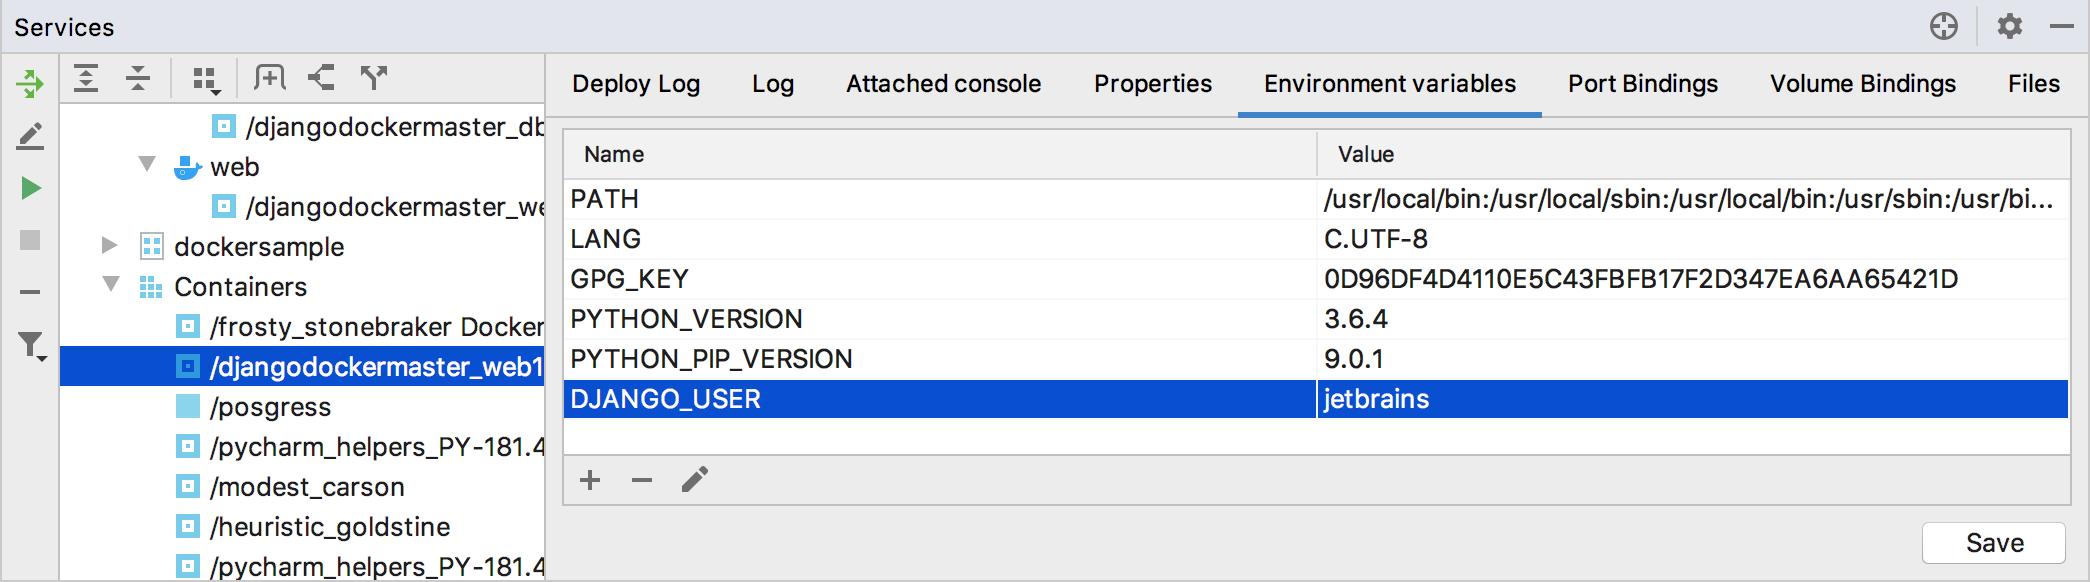 The Environment Variables tab